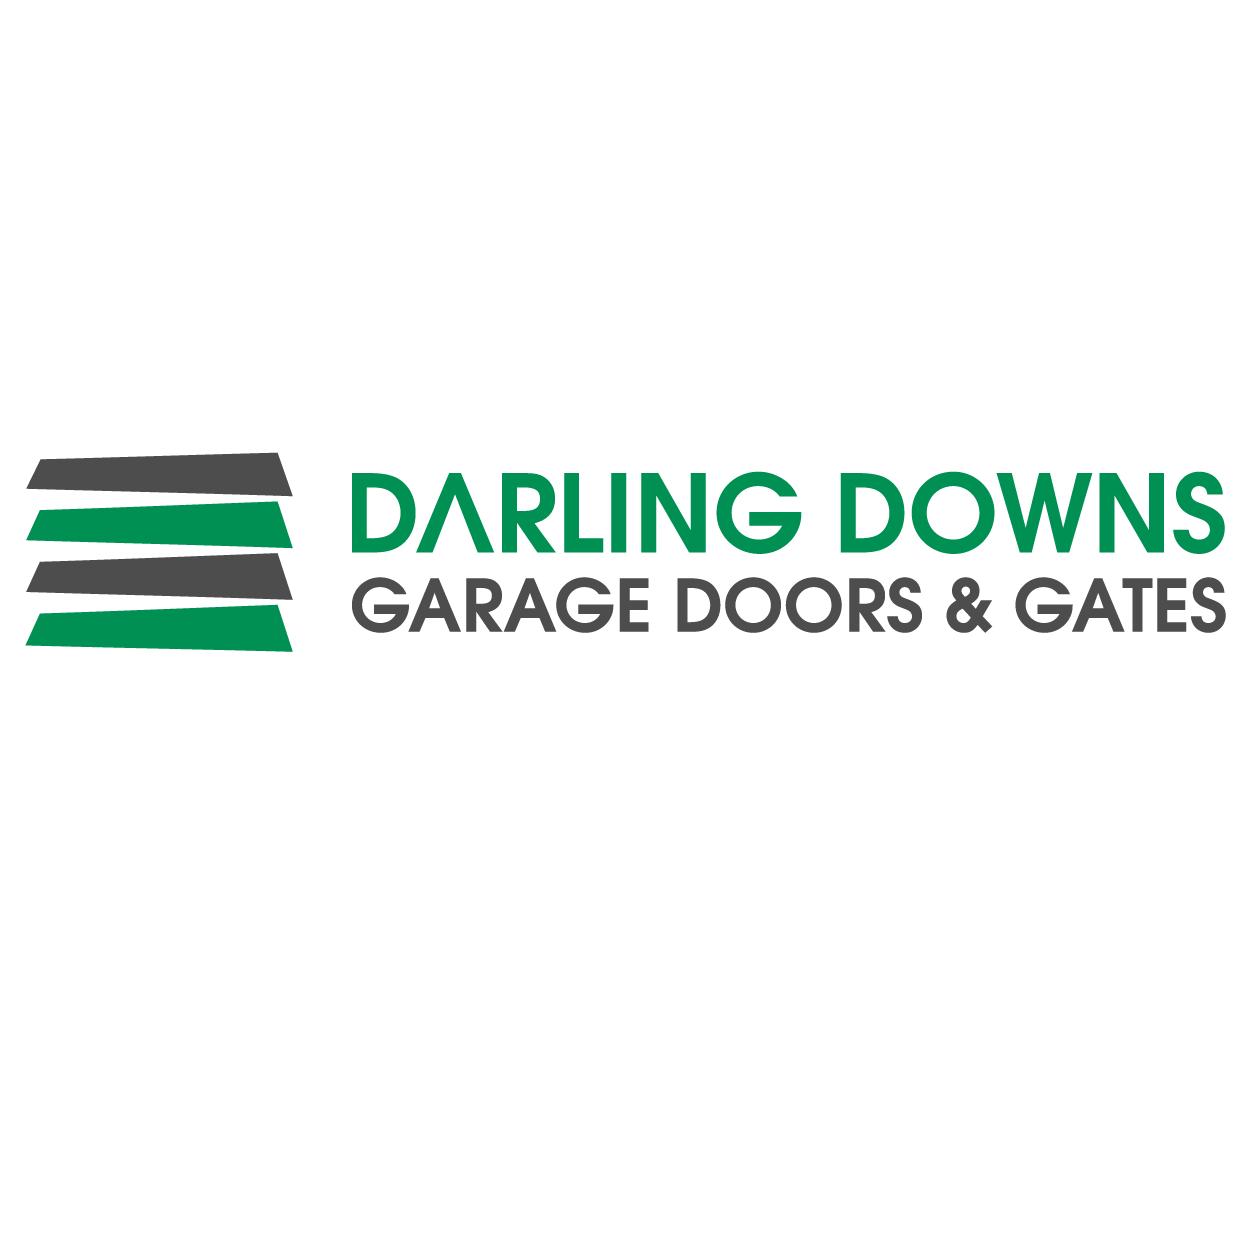 Darling Downs Garage Doors and Gates